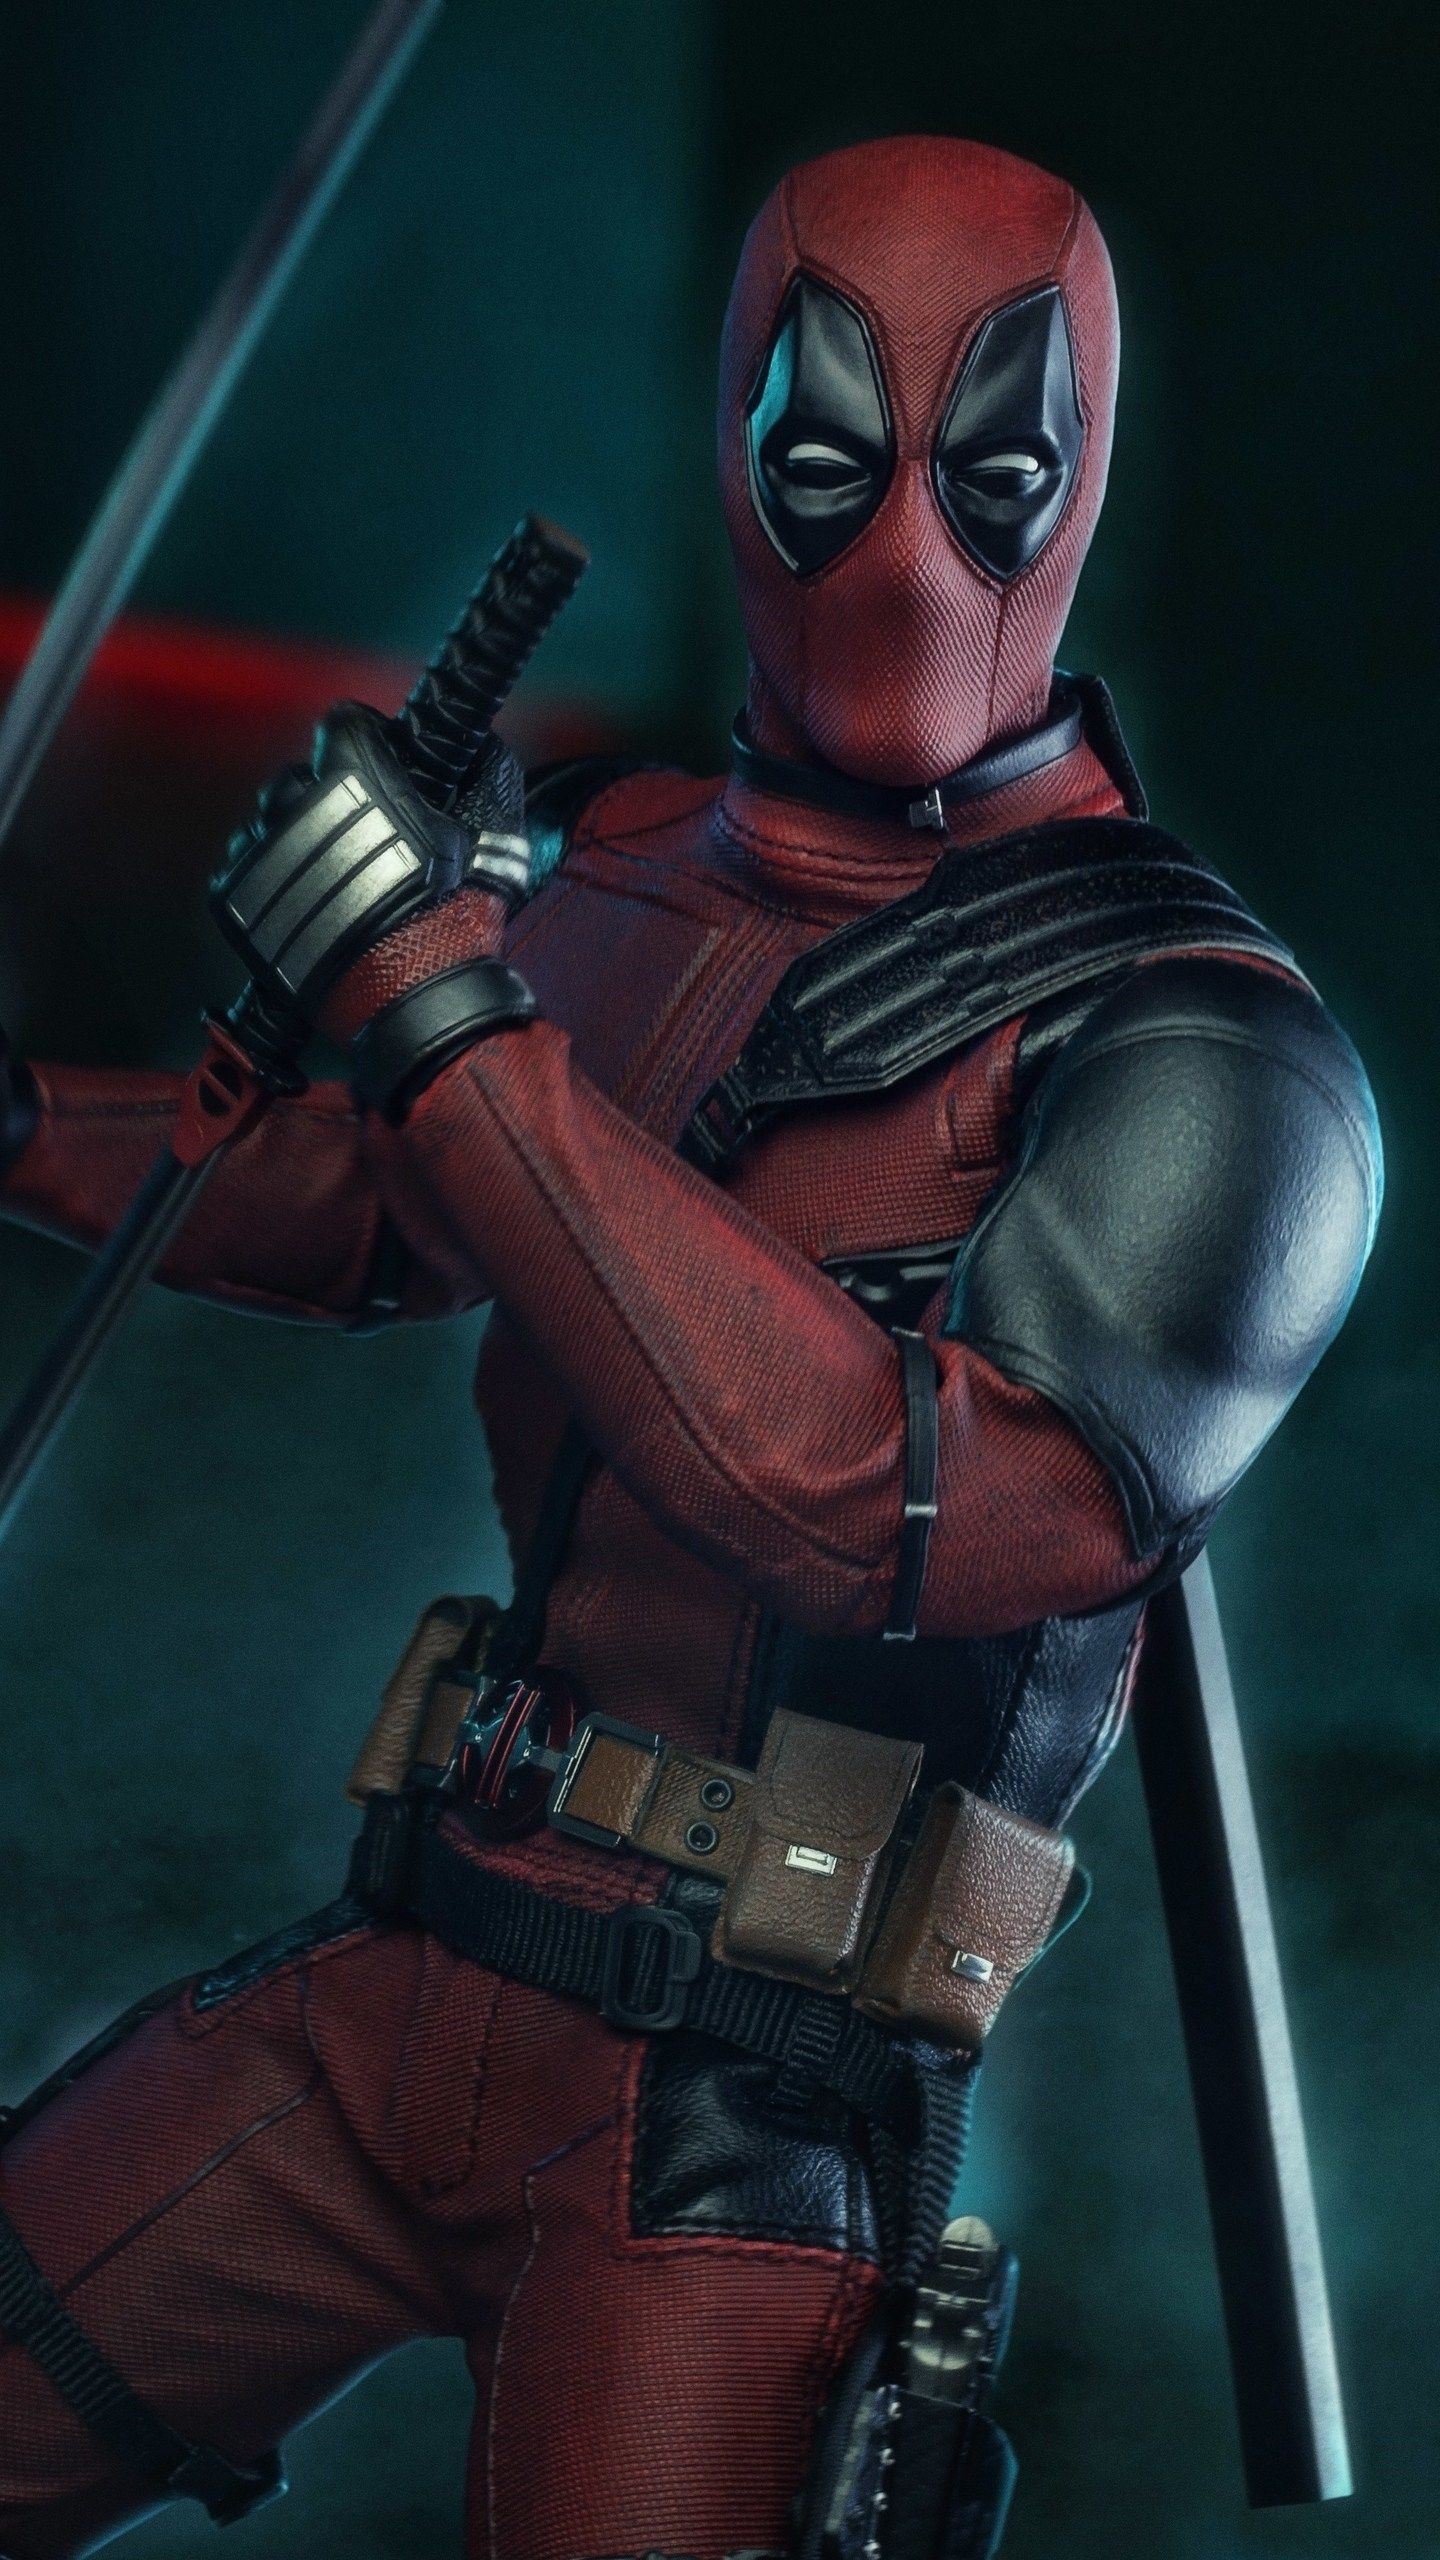 Download Hd Movie Wallpapers Deadpool Wallpaper Deadpool Artwork Deadpool Pictures